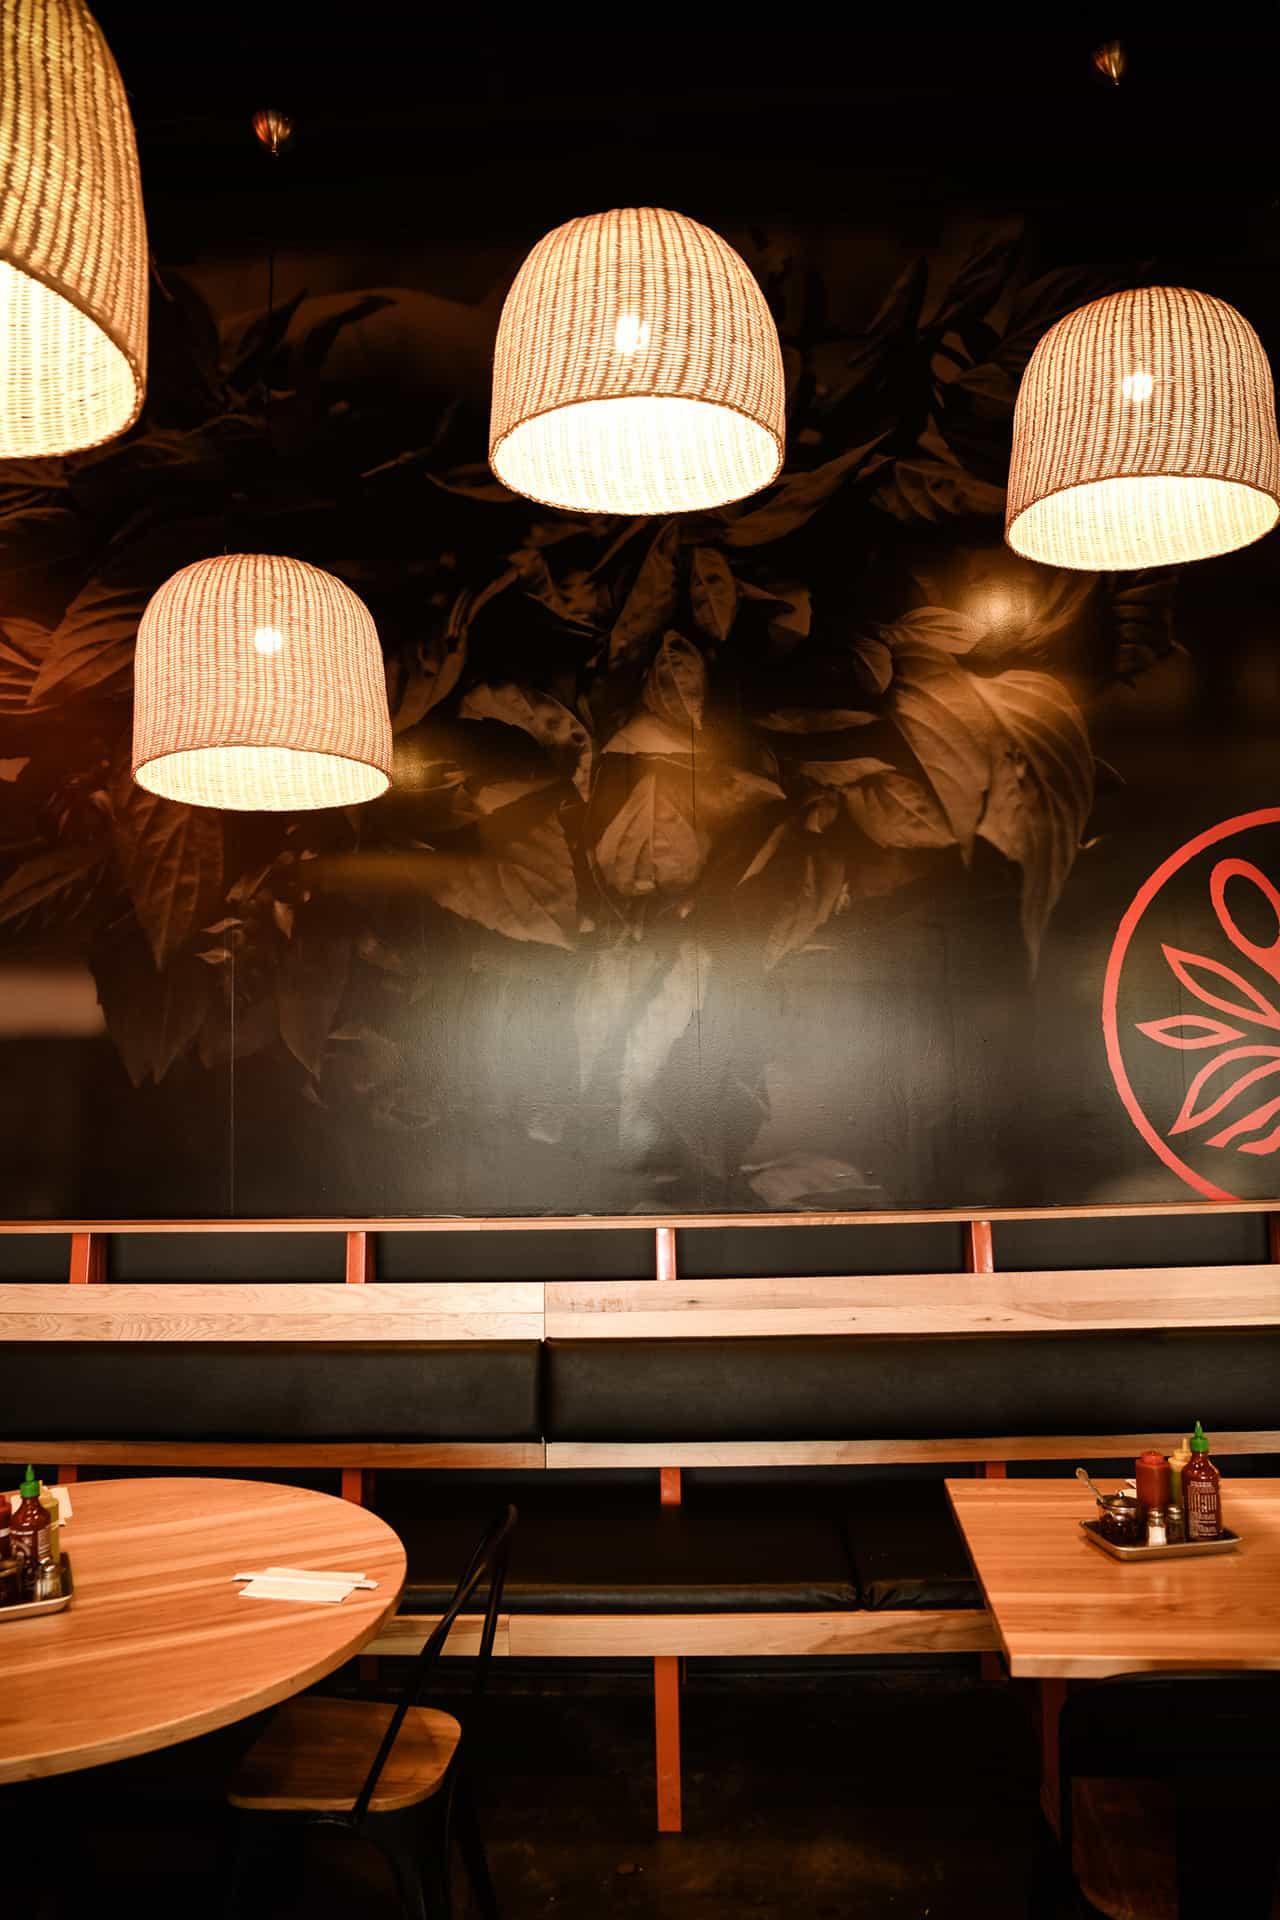 Vietvana - vietnamese full service restaurant interior design